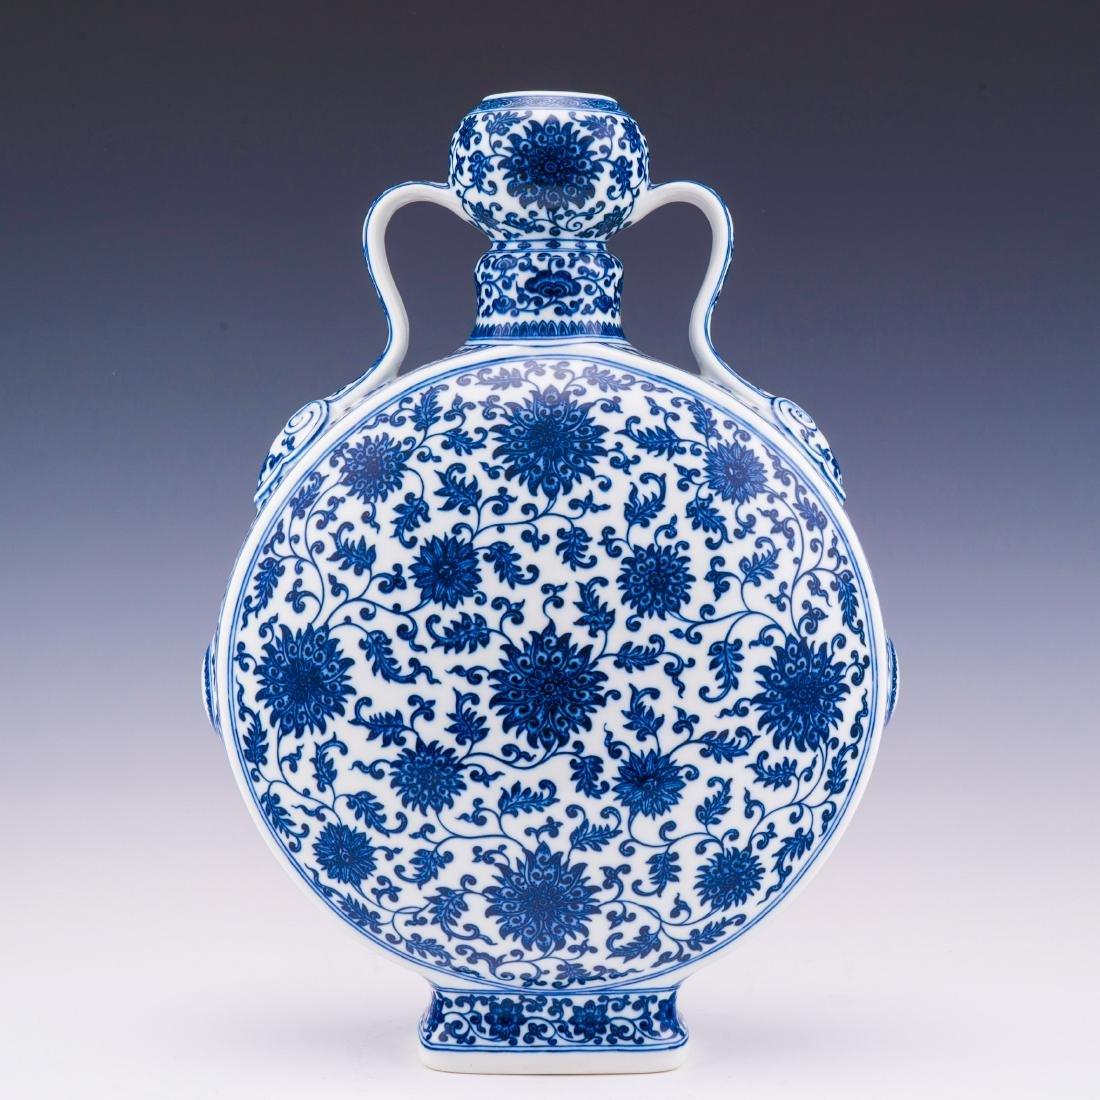 QIANLONG MOONFLASK BLUE & WHITE